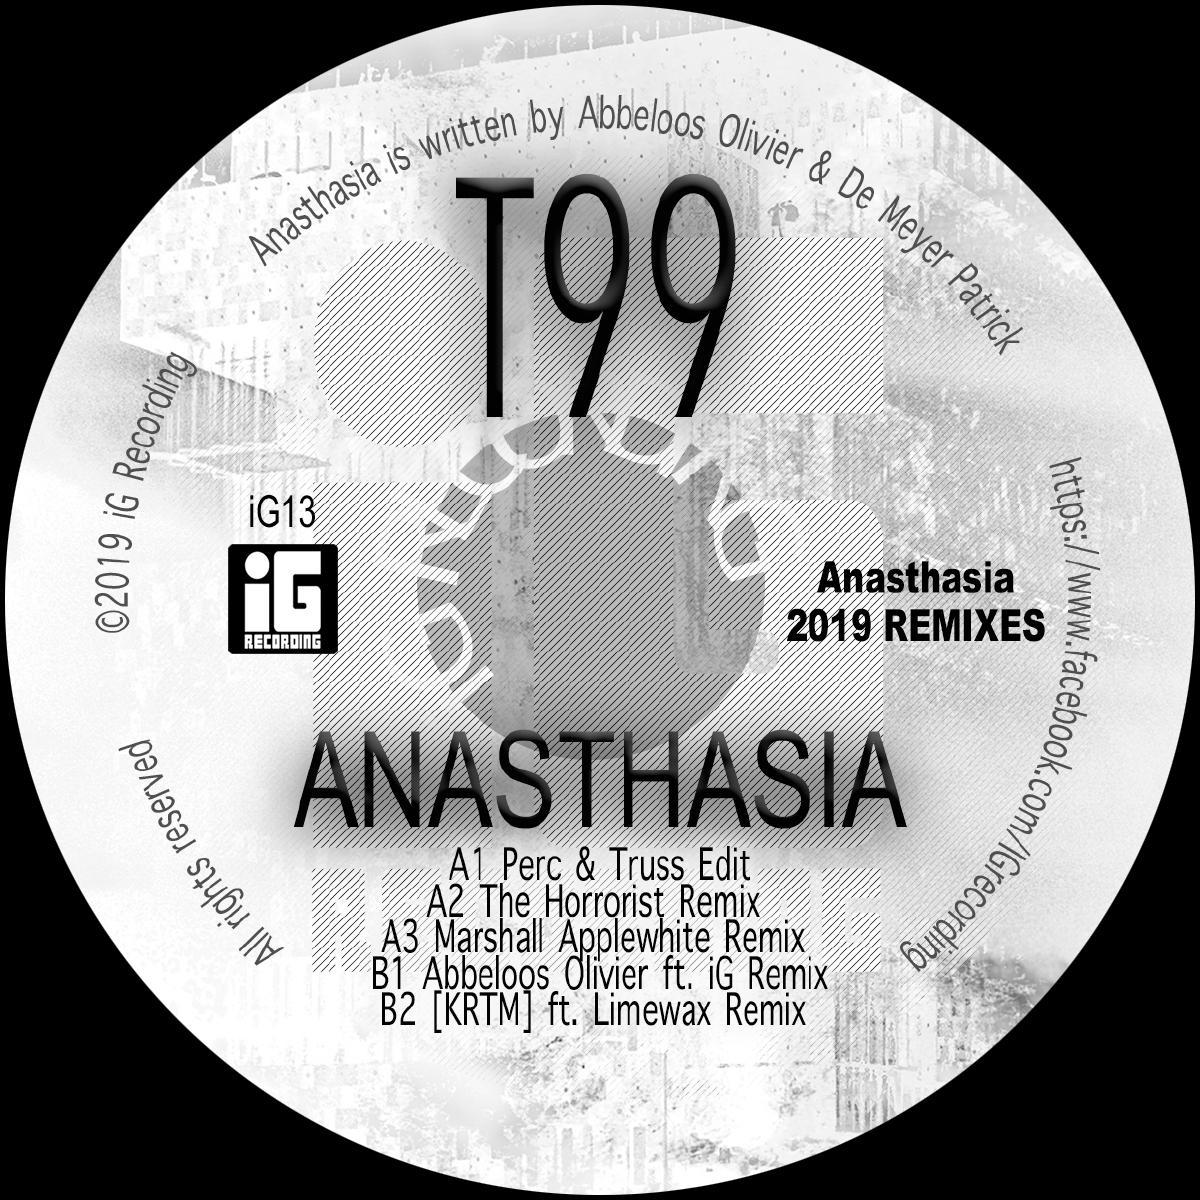 "T99/ANASTHASIA (2019 REMIXES) 12"""